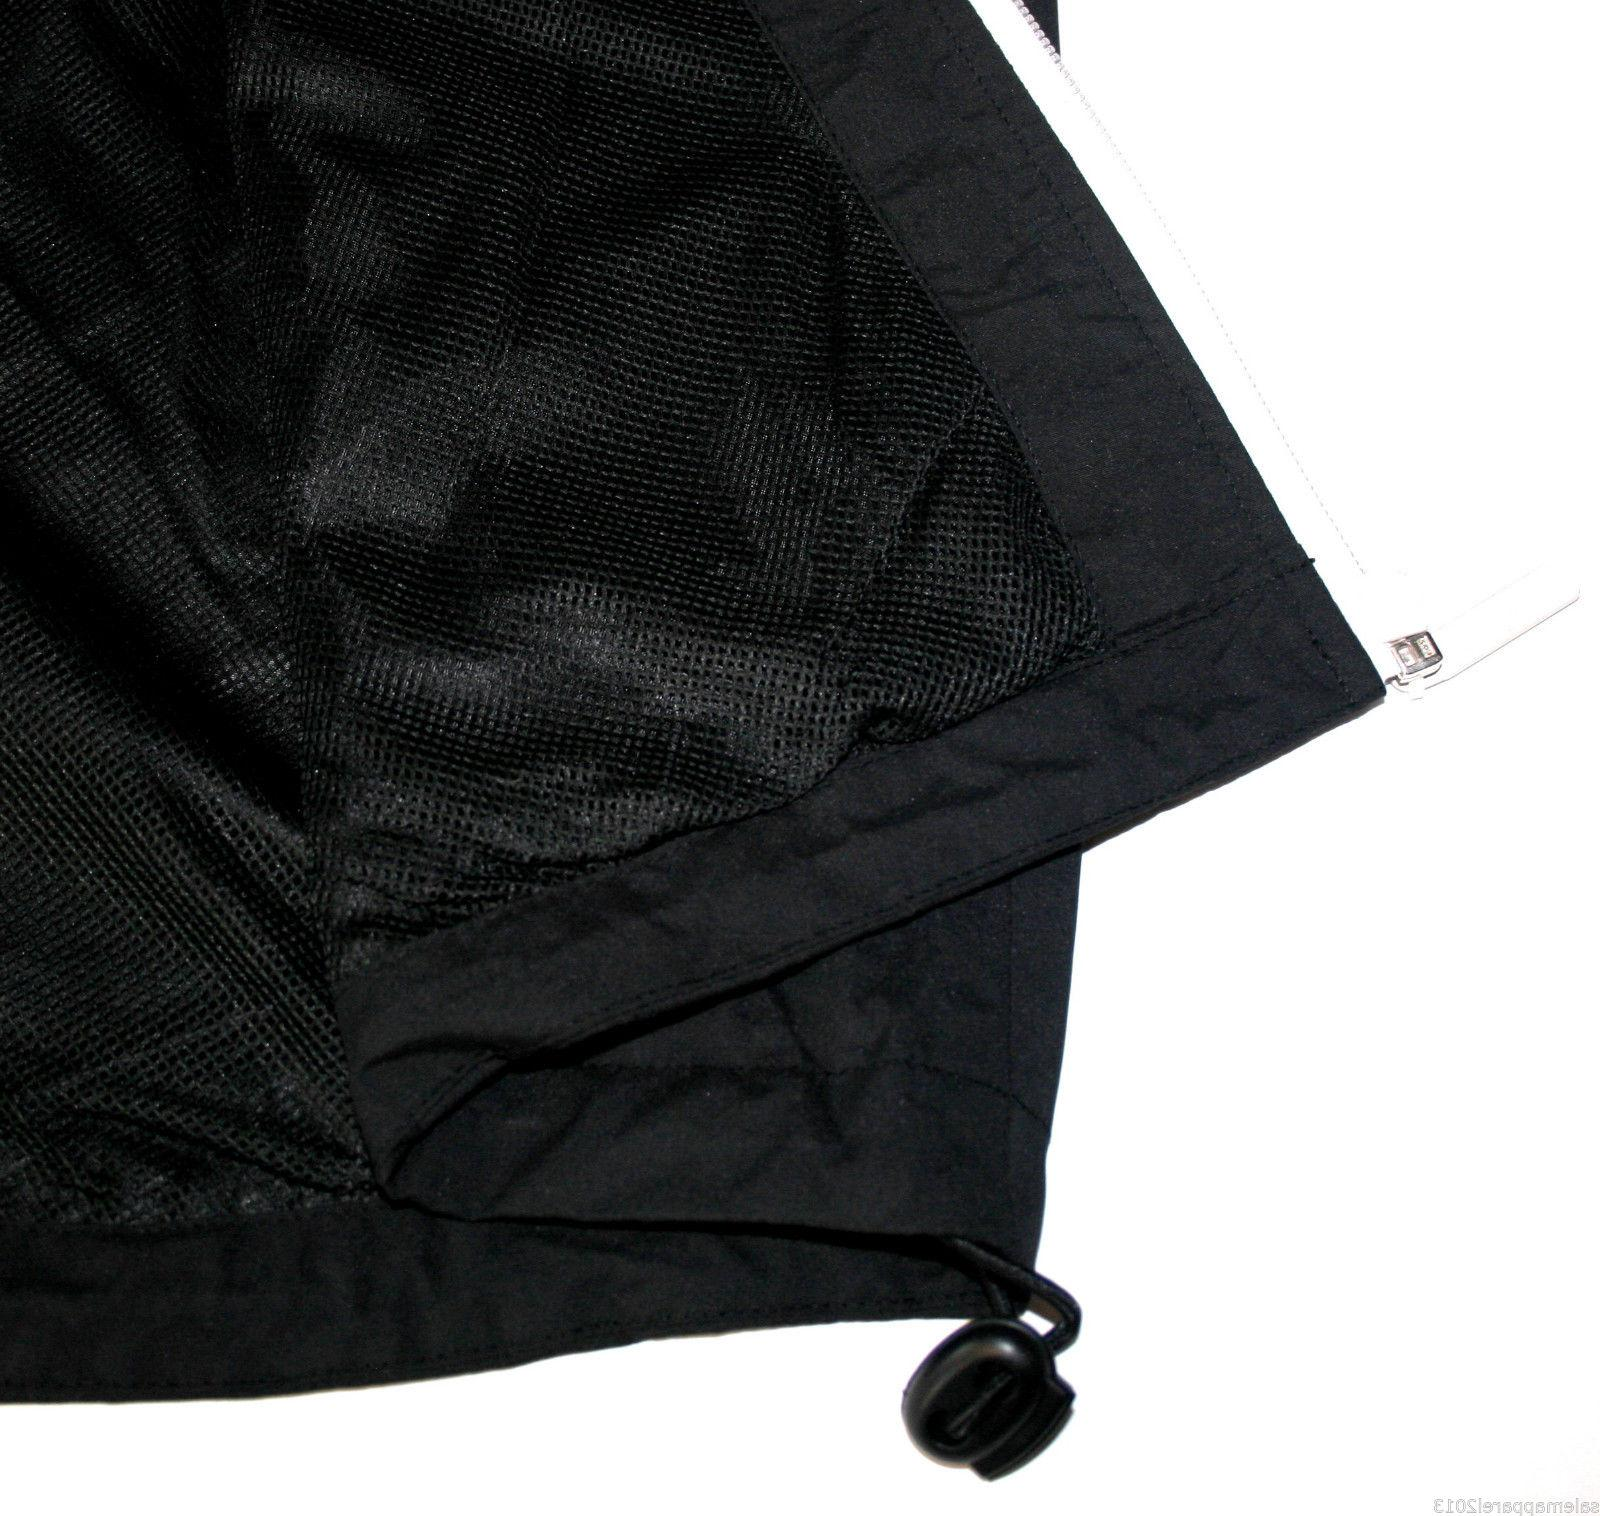 THE COMPANY GOLF VEST JACKET BLACK S M L XL 3XL